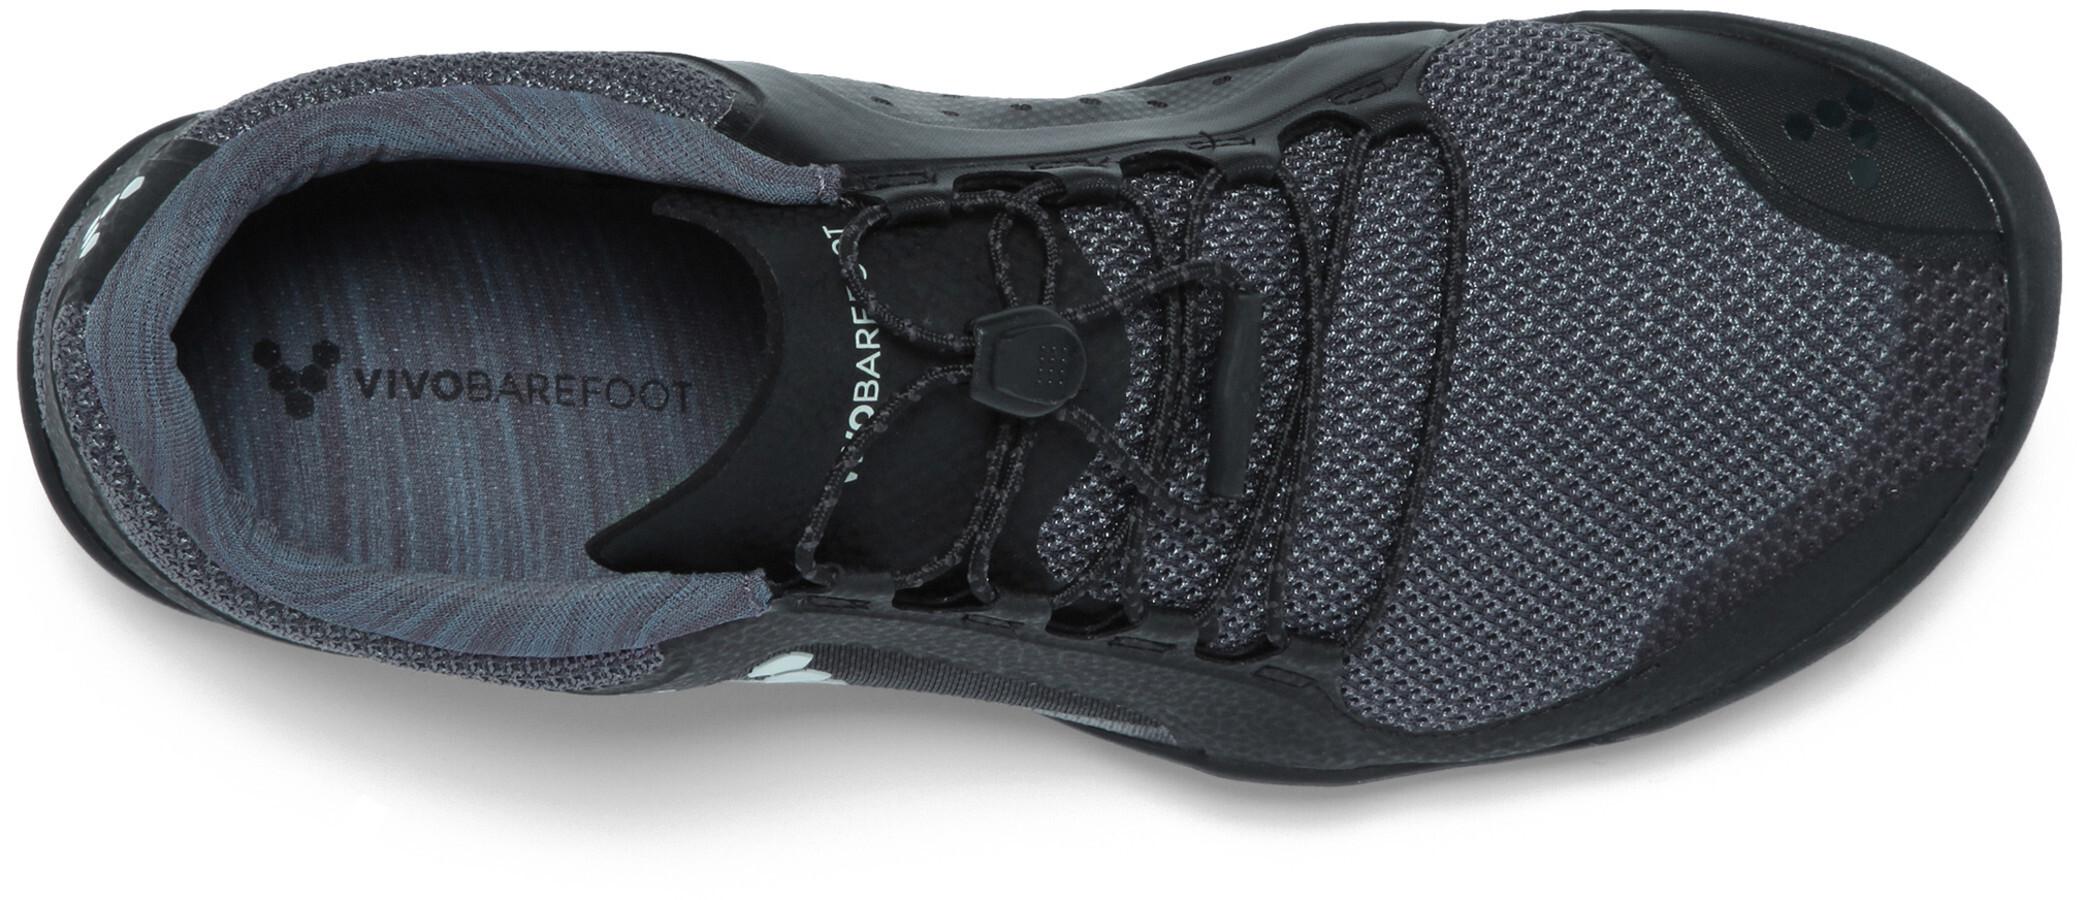 cb918b10ad3960 Vivobarefoot Primus Trail FG Mesh Chaussures running Homme, black/charcoal